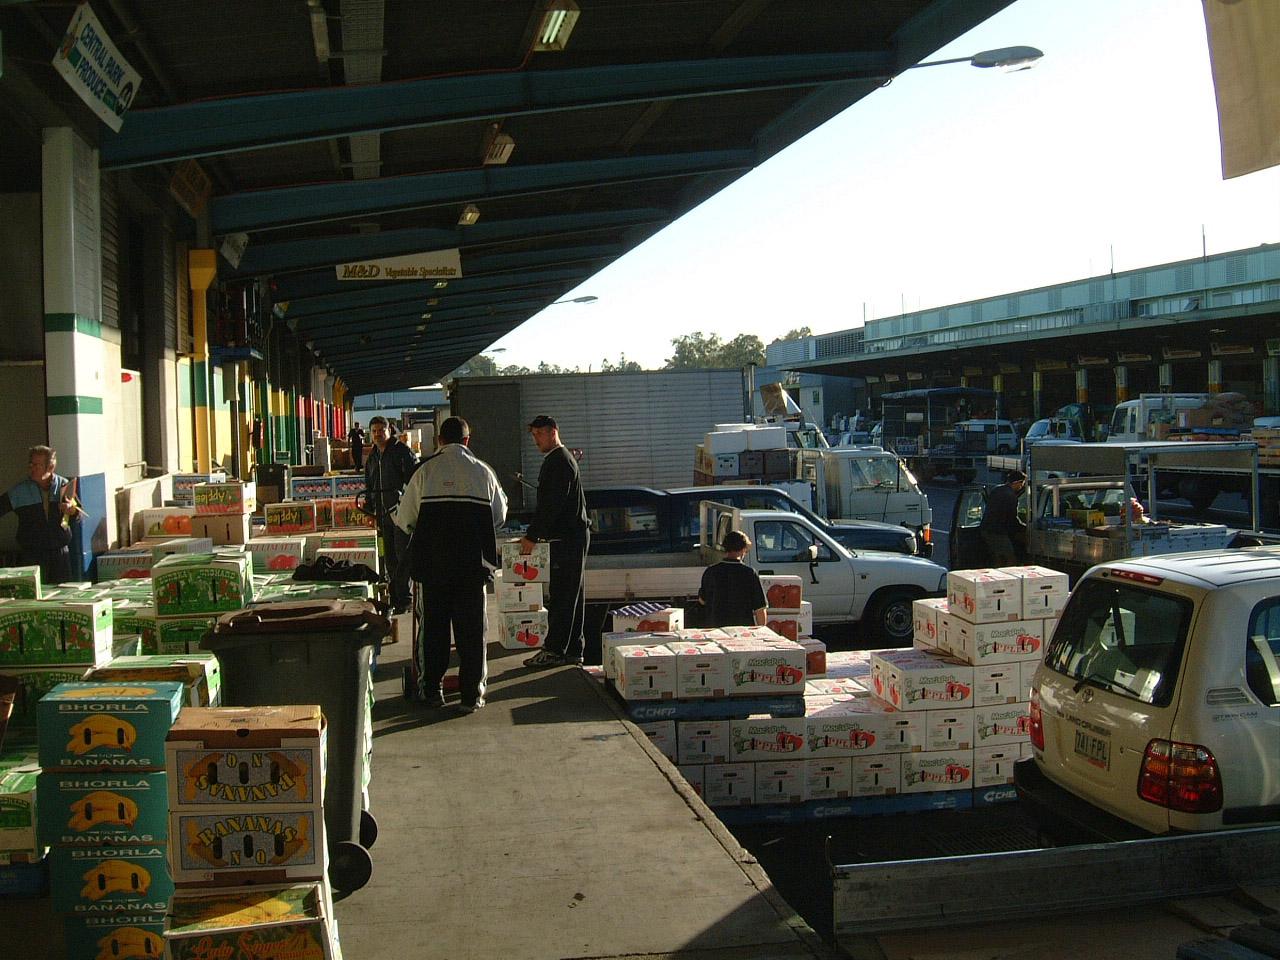 Brisbane Markets Sherwood Road Rocklea Queensland 4106 Jun 2002 I05